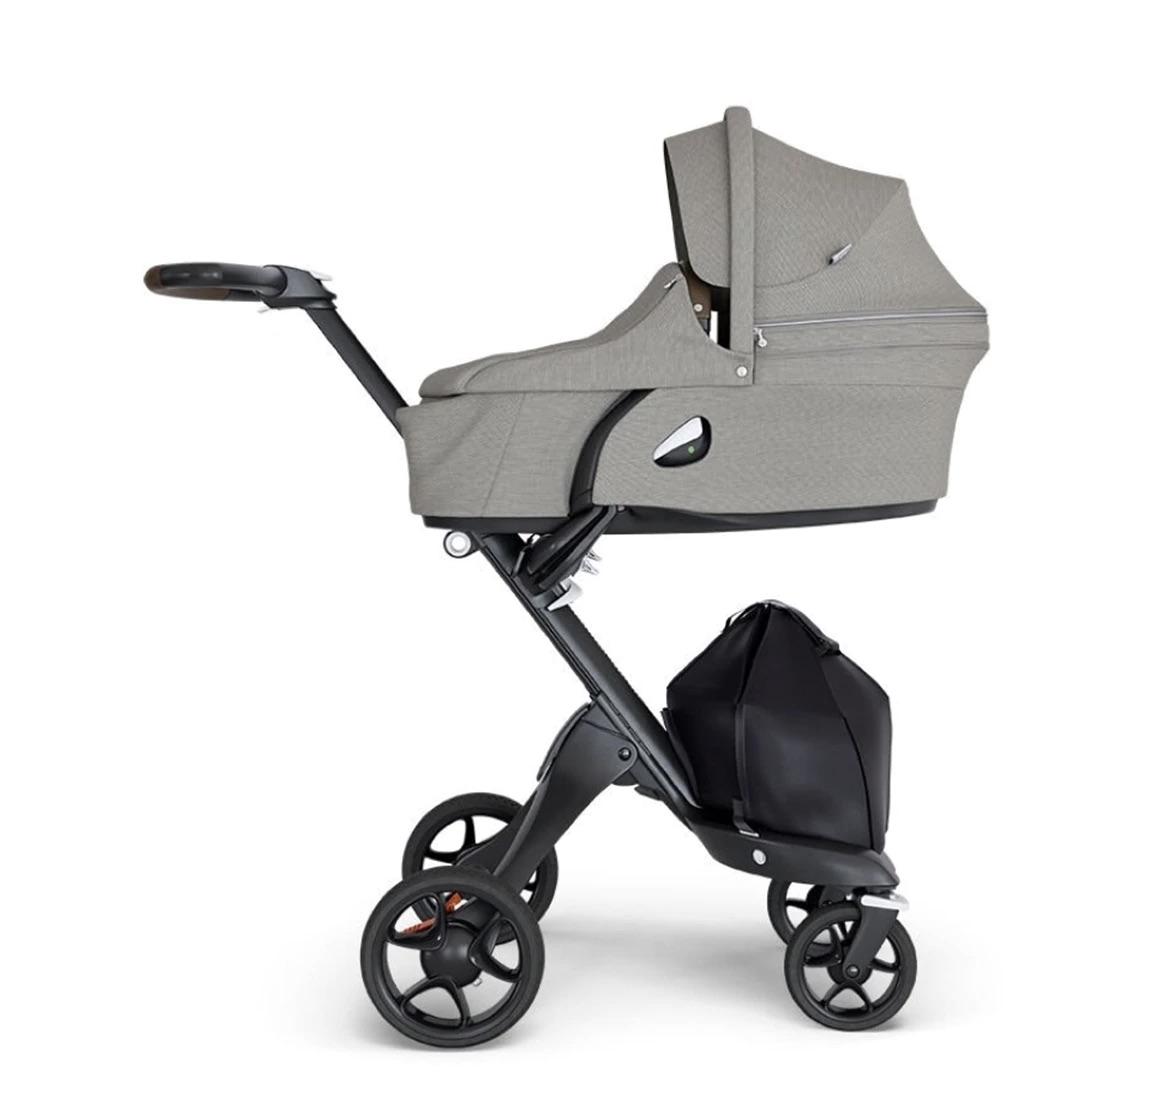 STOKKE Silla de paseo Stokke ® Xplory 6 gris satinado